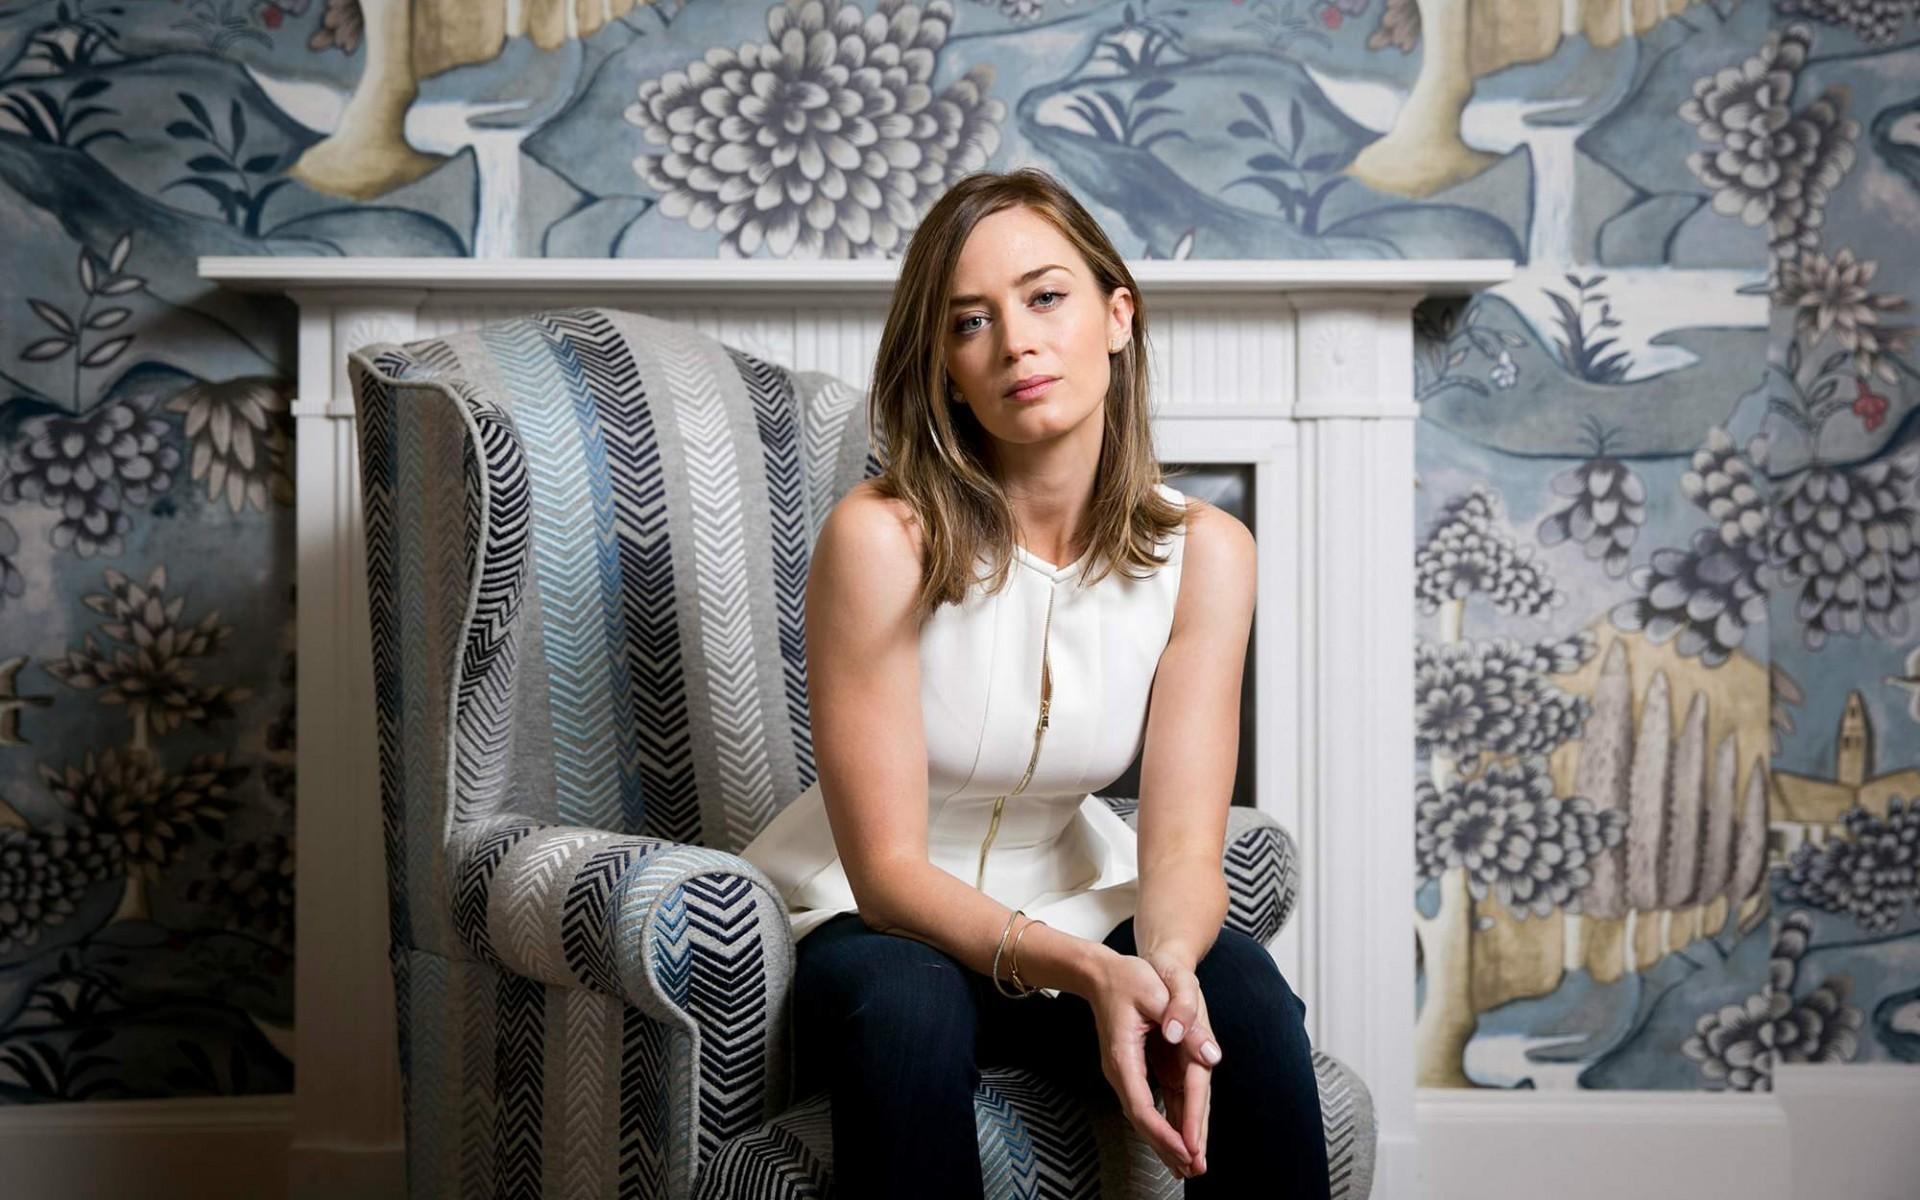 Oblivion Wallpaper Hd 20 Gorgeous Hd Emily Blunt Wallpapers